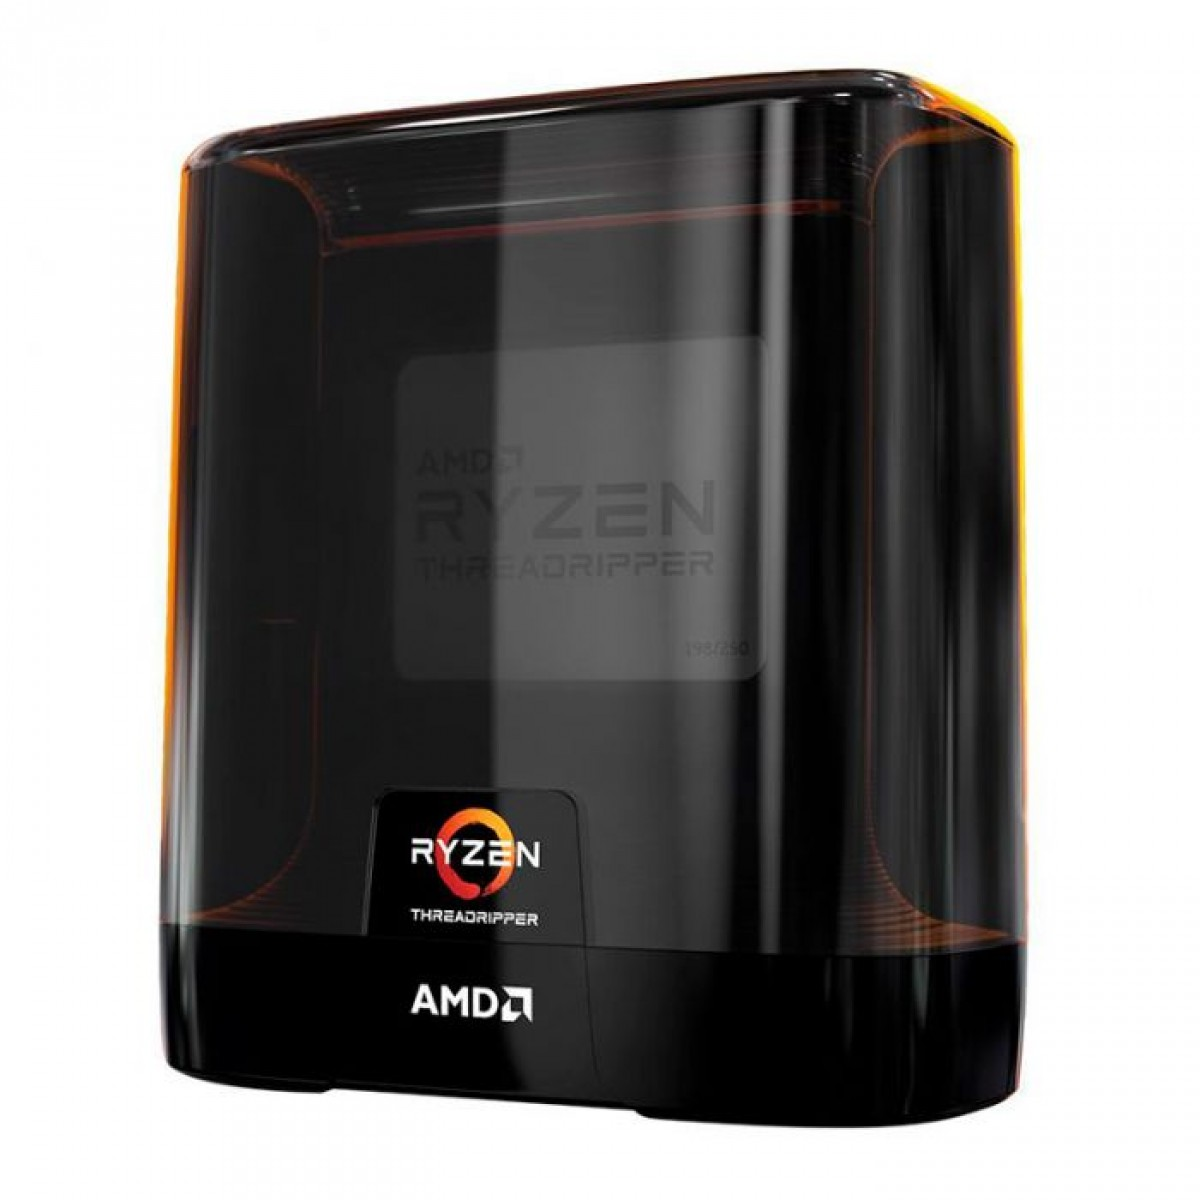 Processador AMD Ryzen Threadripper 3960X 3.8GHz (4.5GHz Max Turbo) 24-Core 48-Thread, 140MB sTRX4, 100-100000010WOF